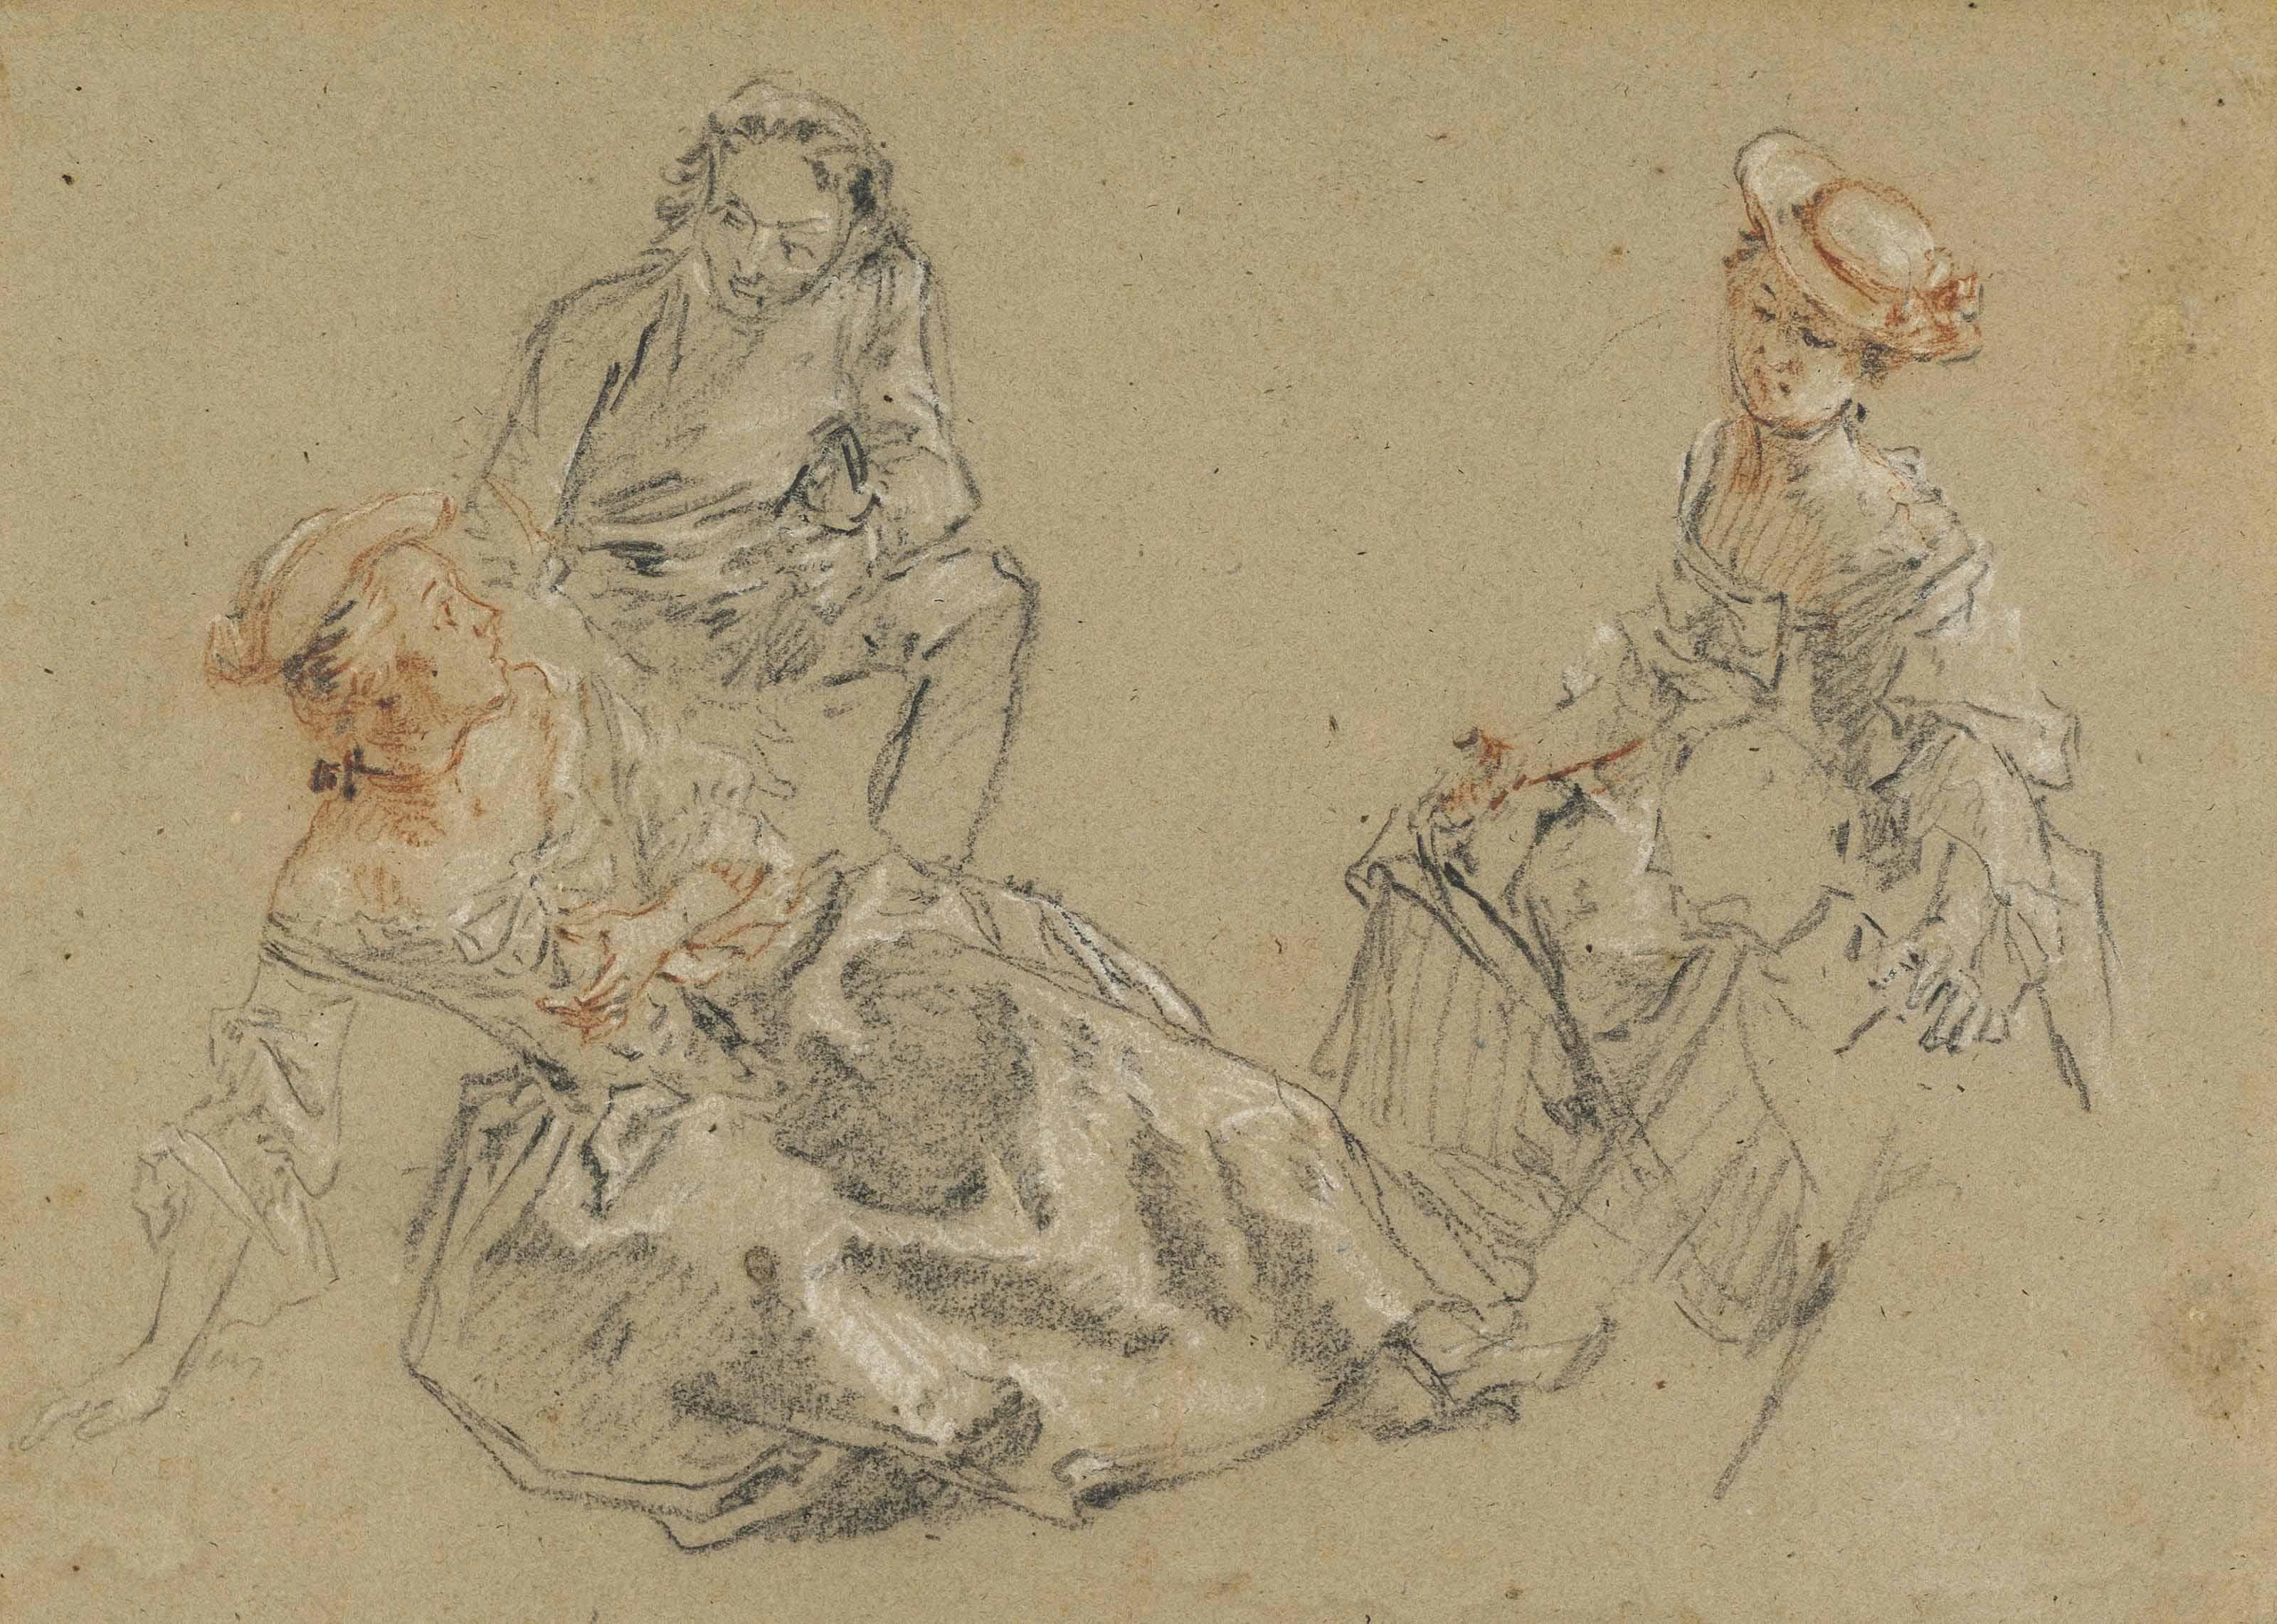 Nicolas Lancret (Paris 1690-1743)